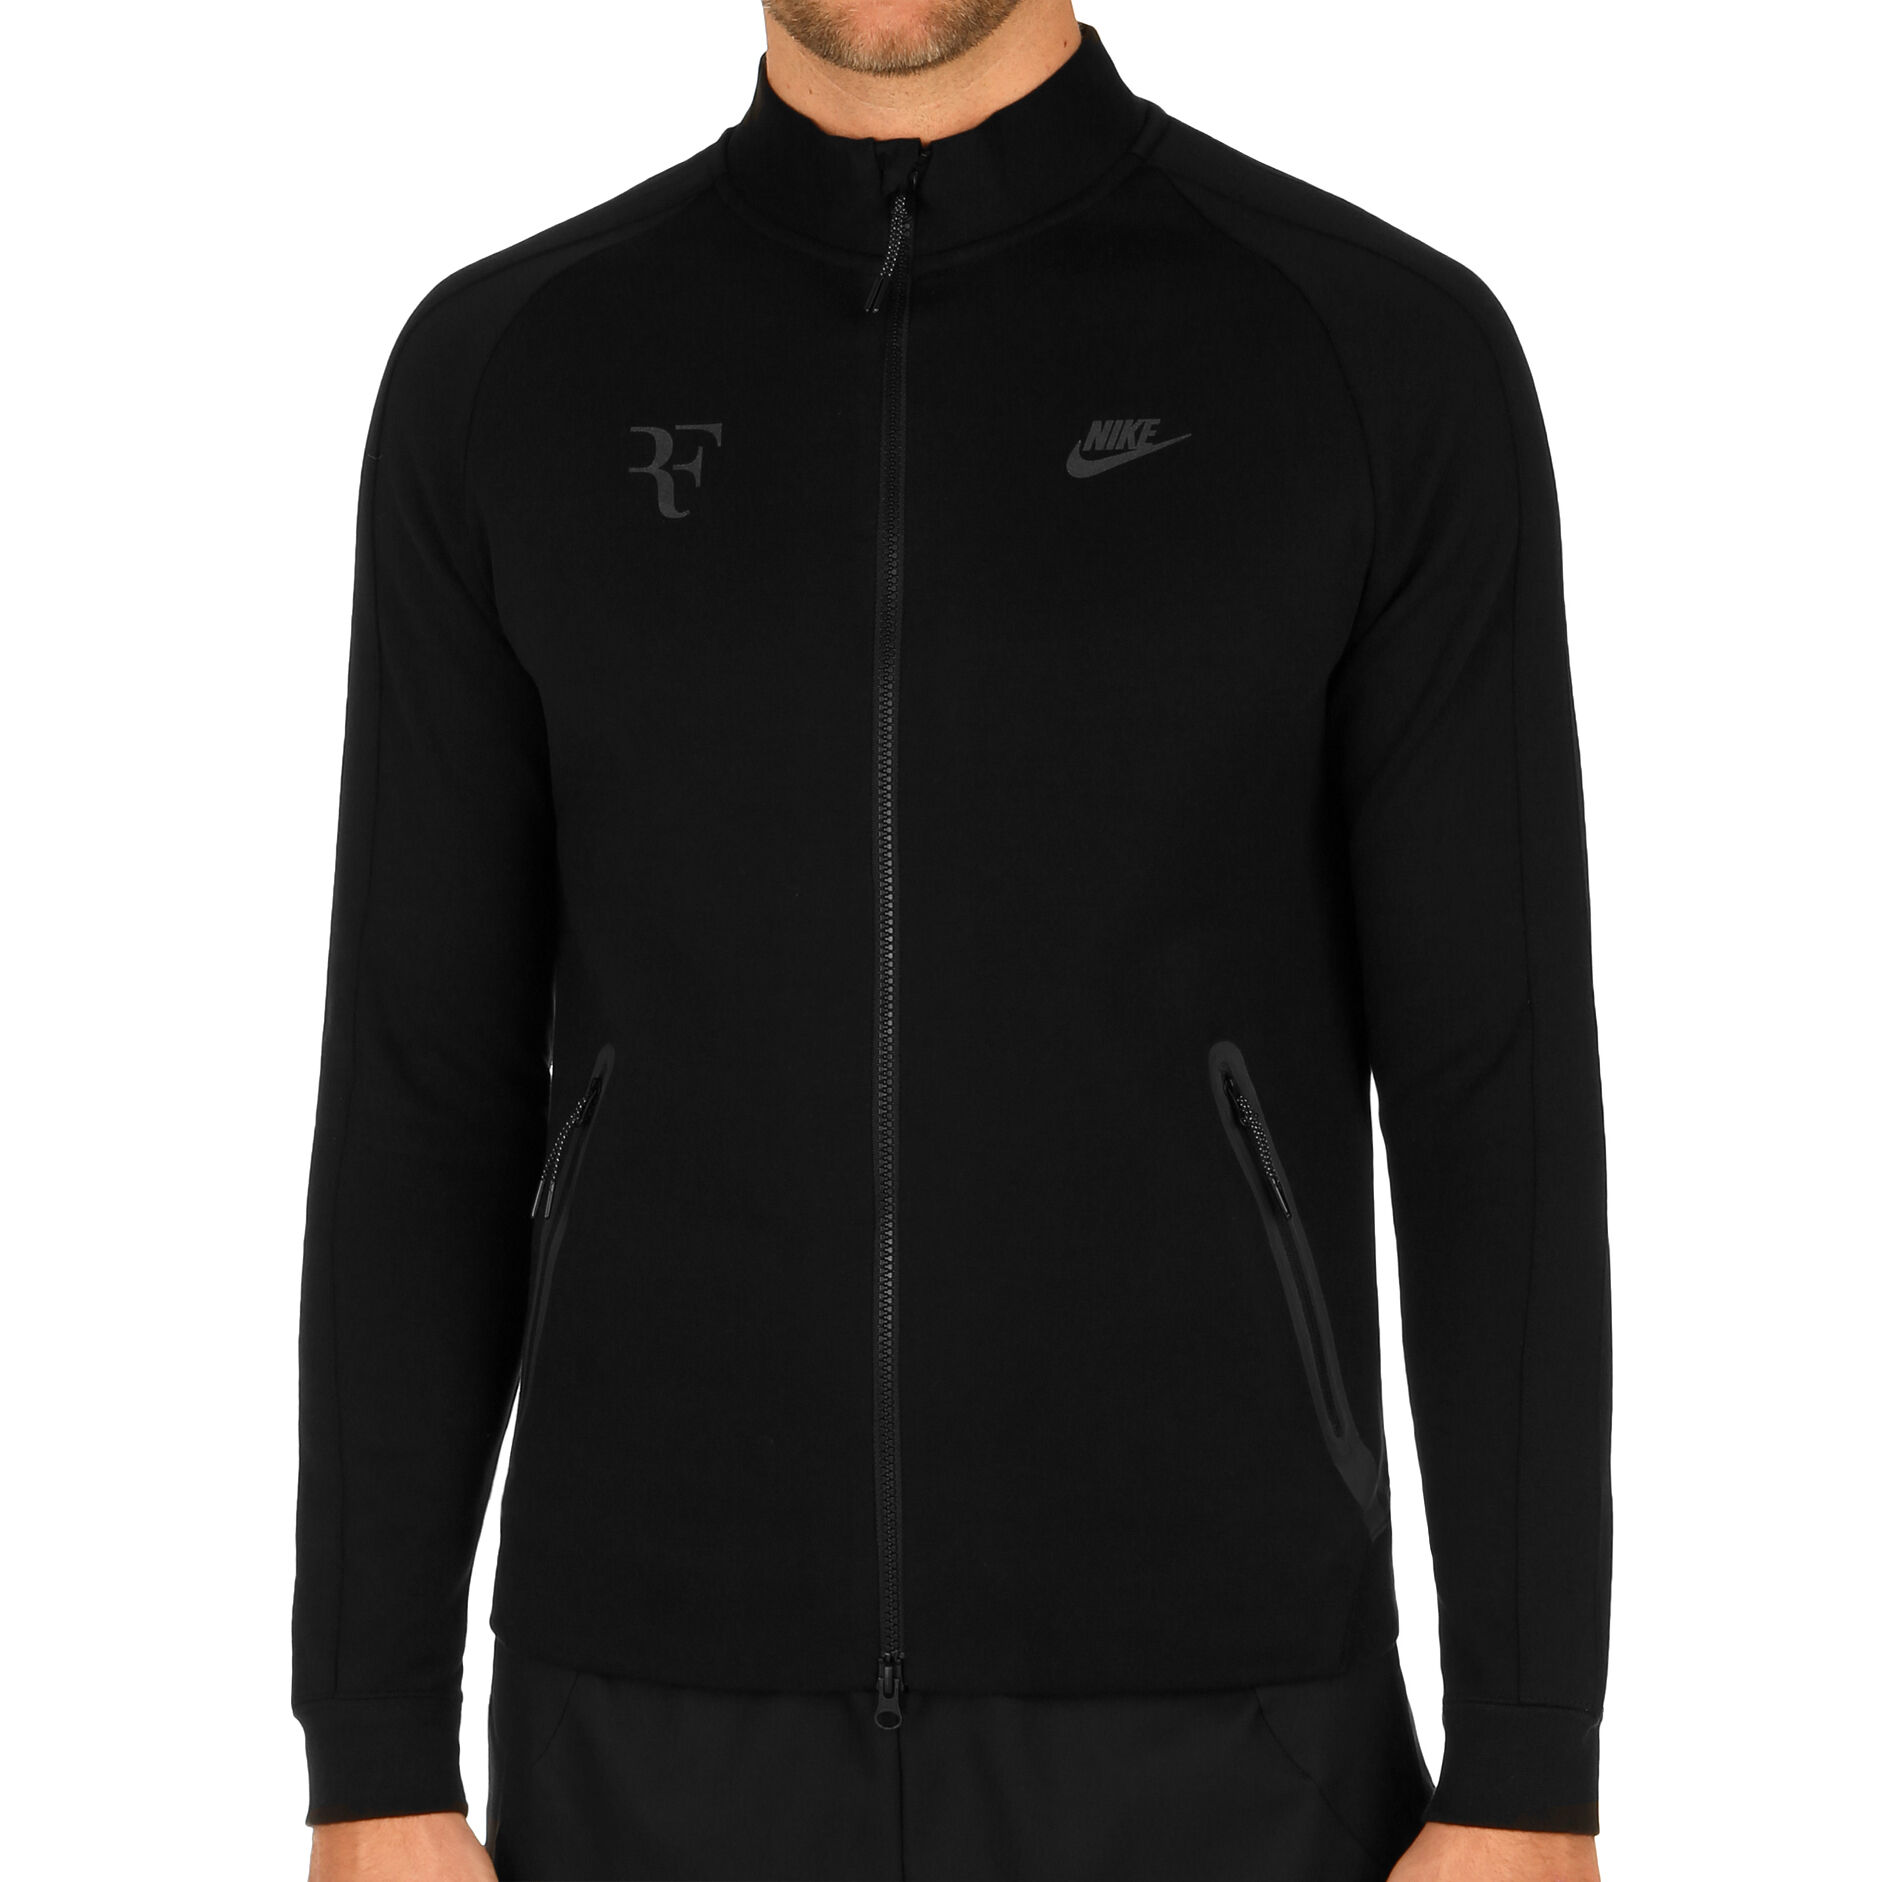 Nike Court Roger Federer Veste De Survêtement Hommes Noir